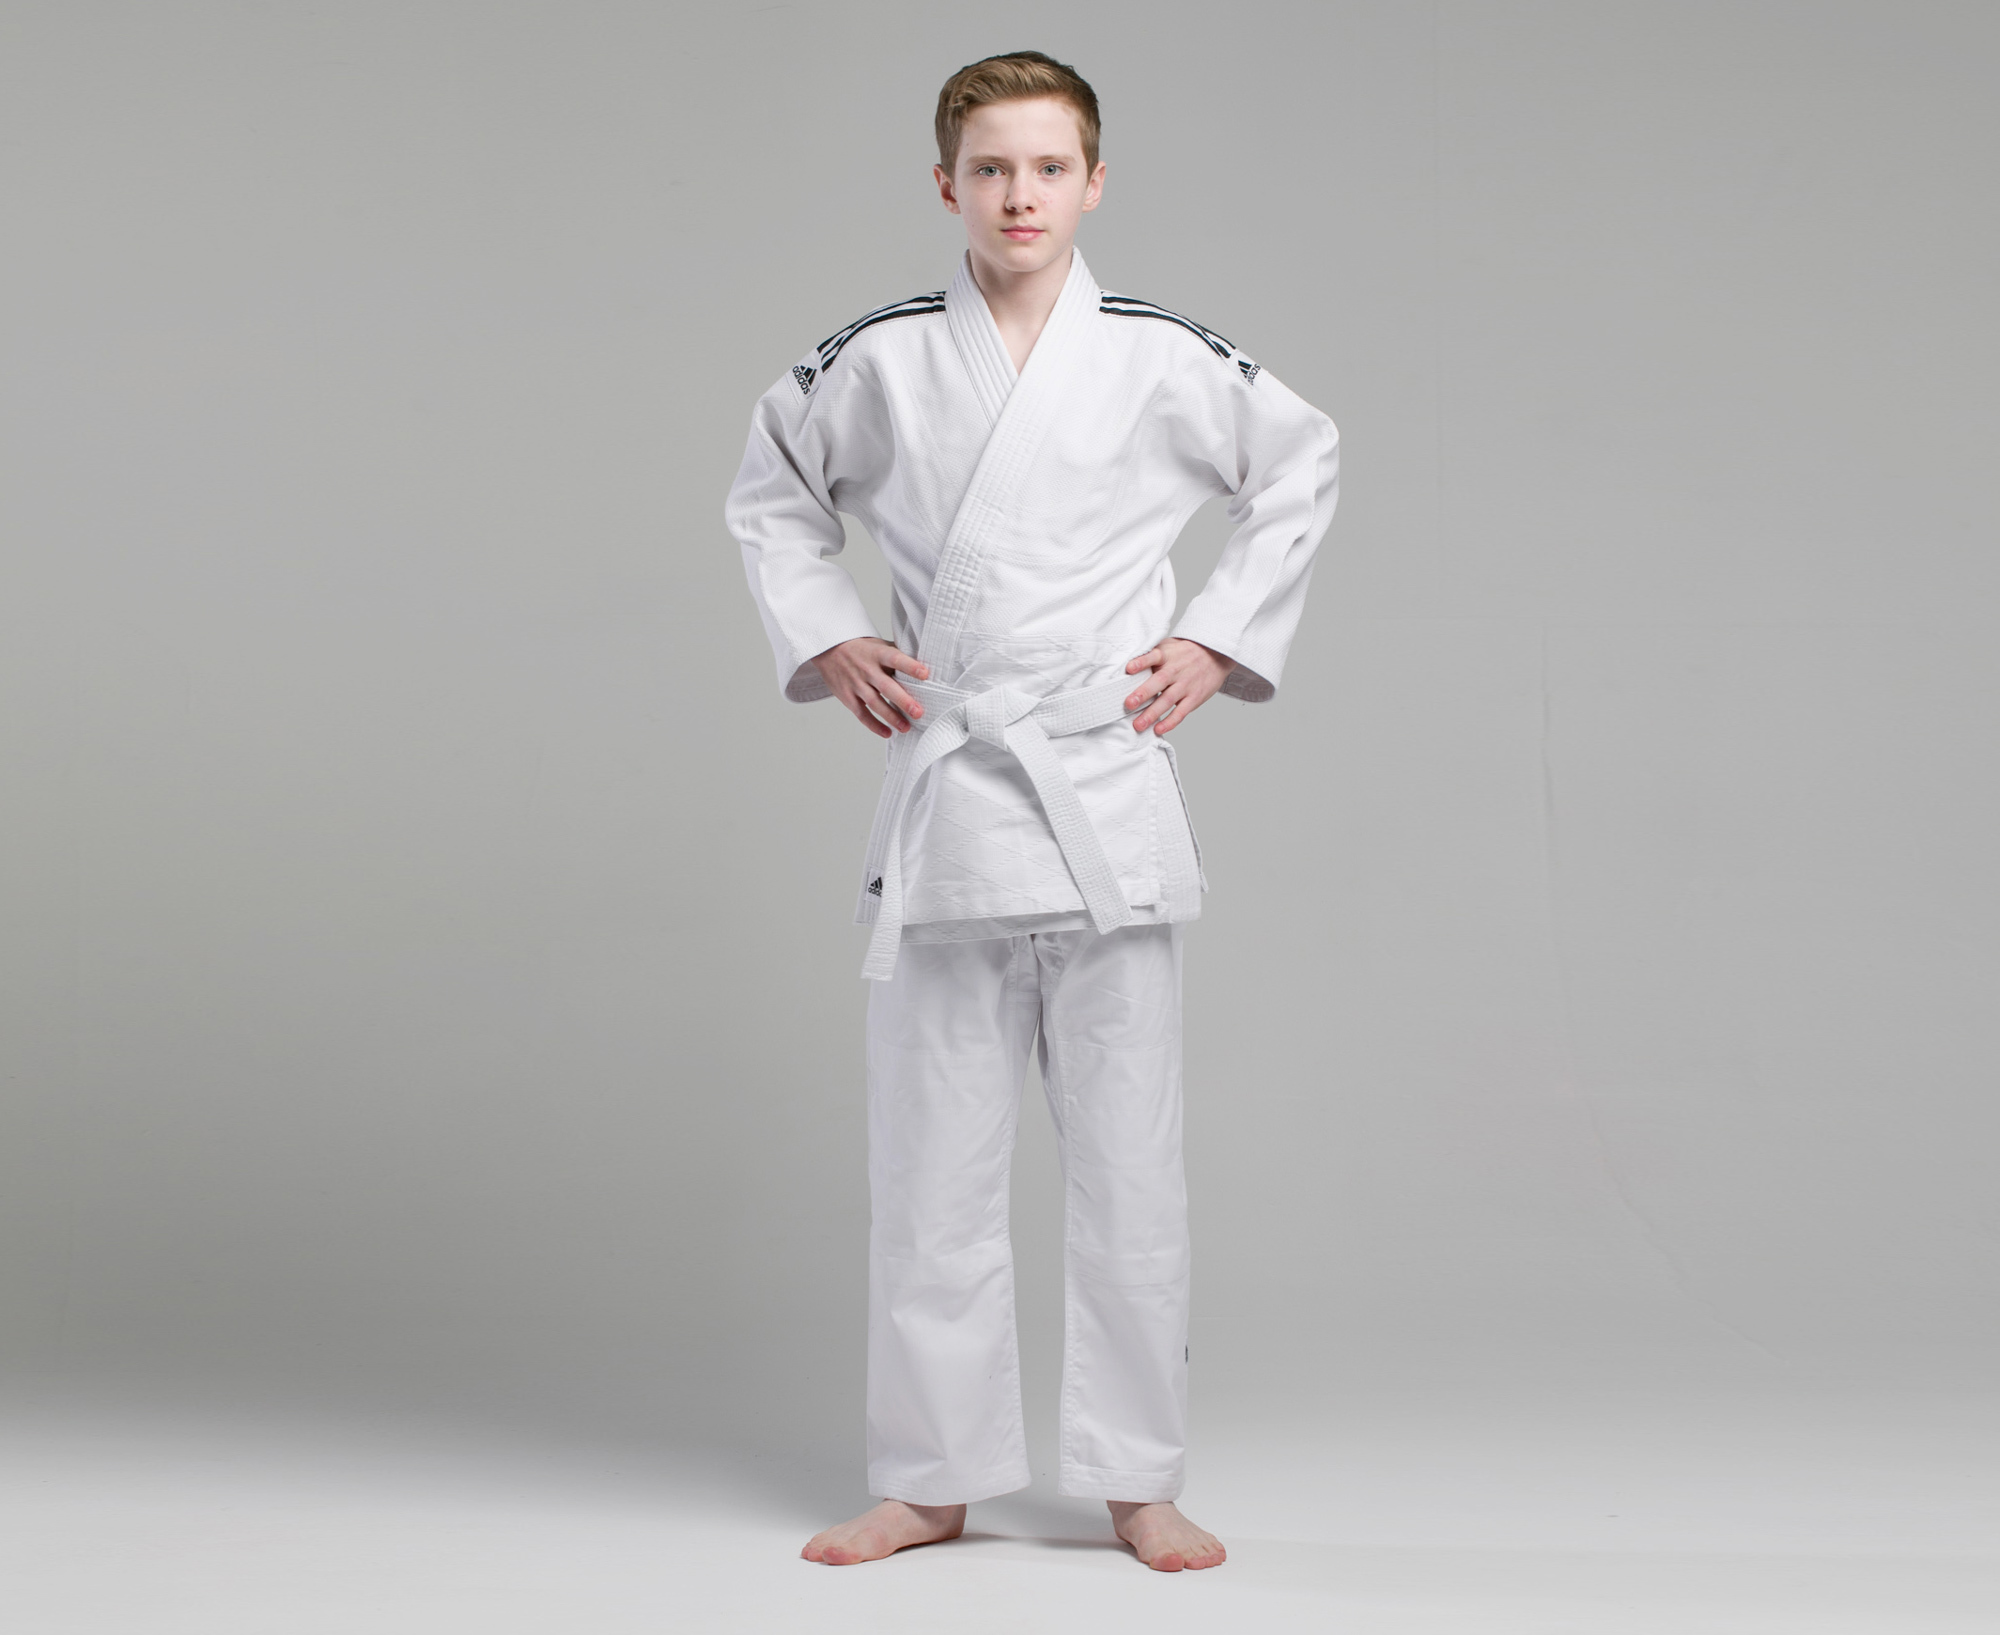 Кимоно и пояса КИМОНО ДЛЯ ДЗЮДО TRAINING БЕЛОЕ kimono_dlya_dzyudo_training_beloe.jpg